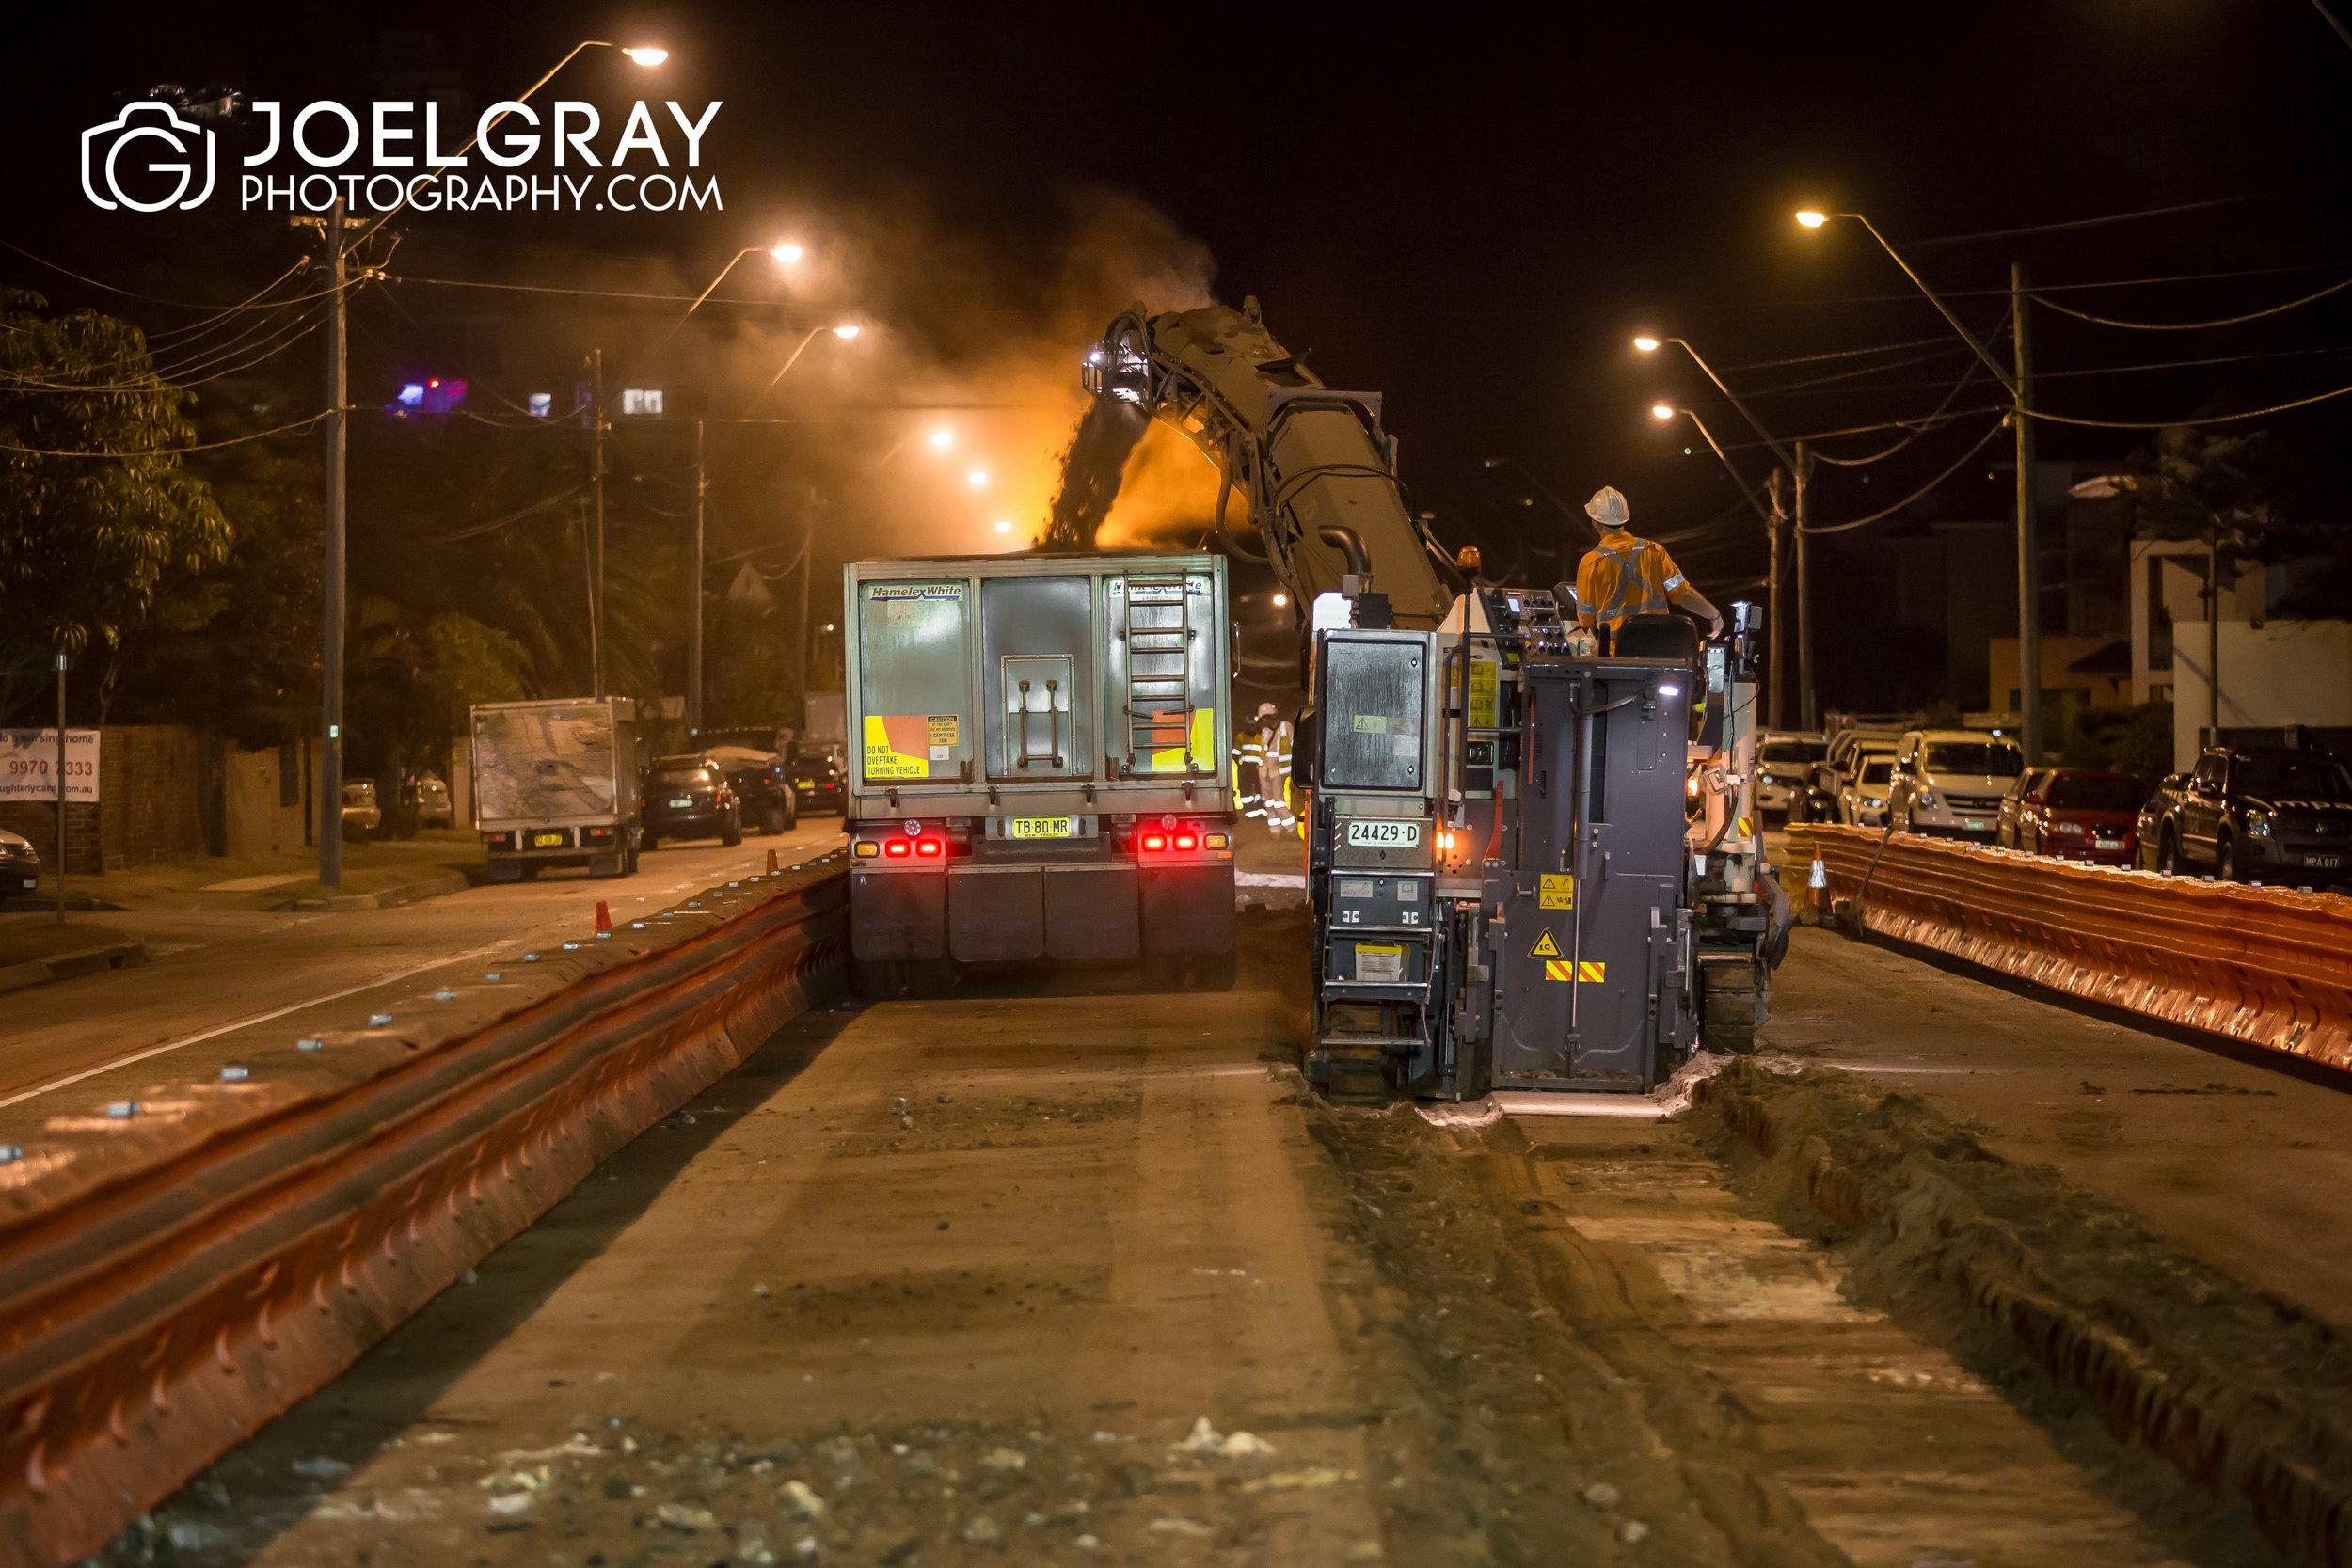 sydney-onsite-photography-roadworks-photographer